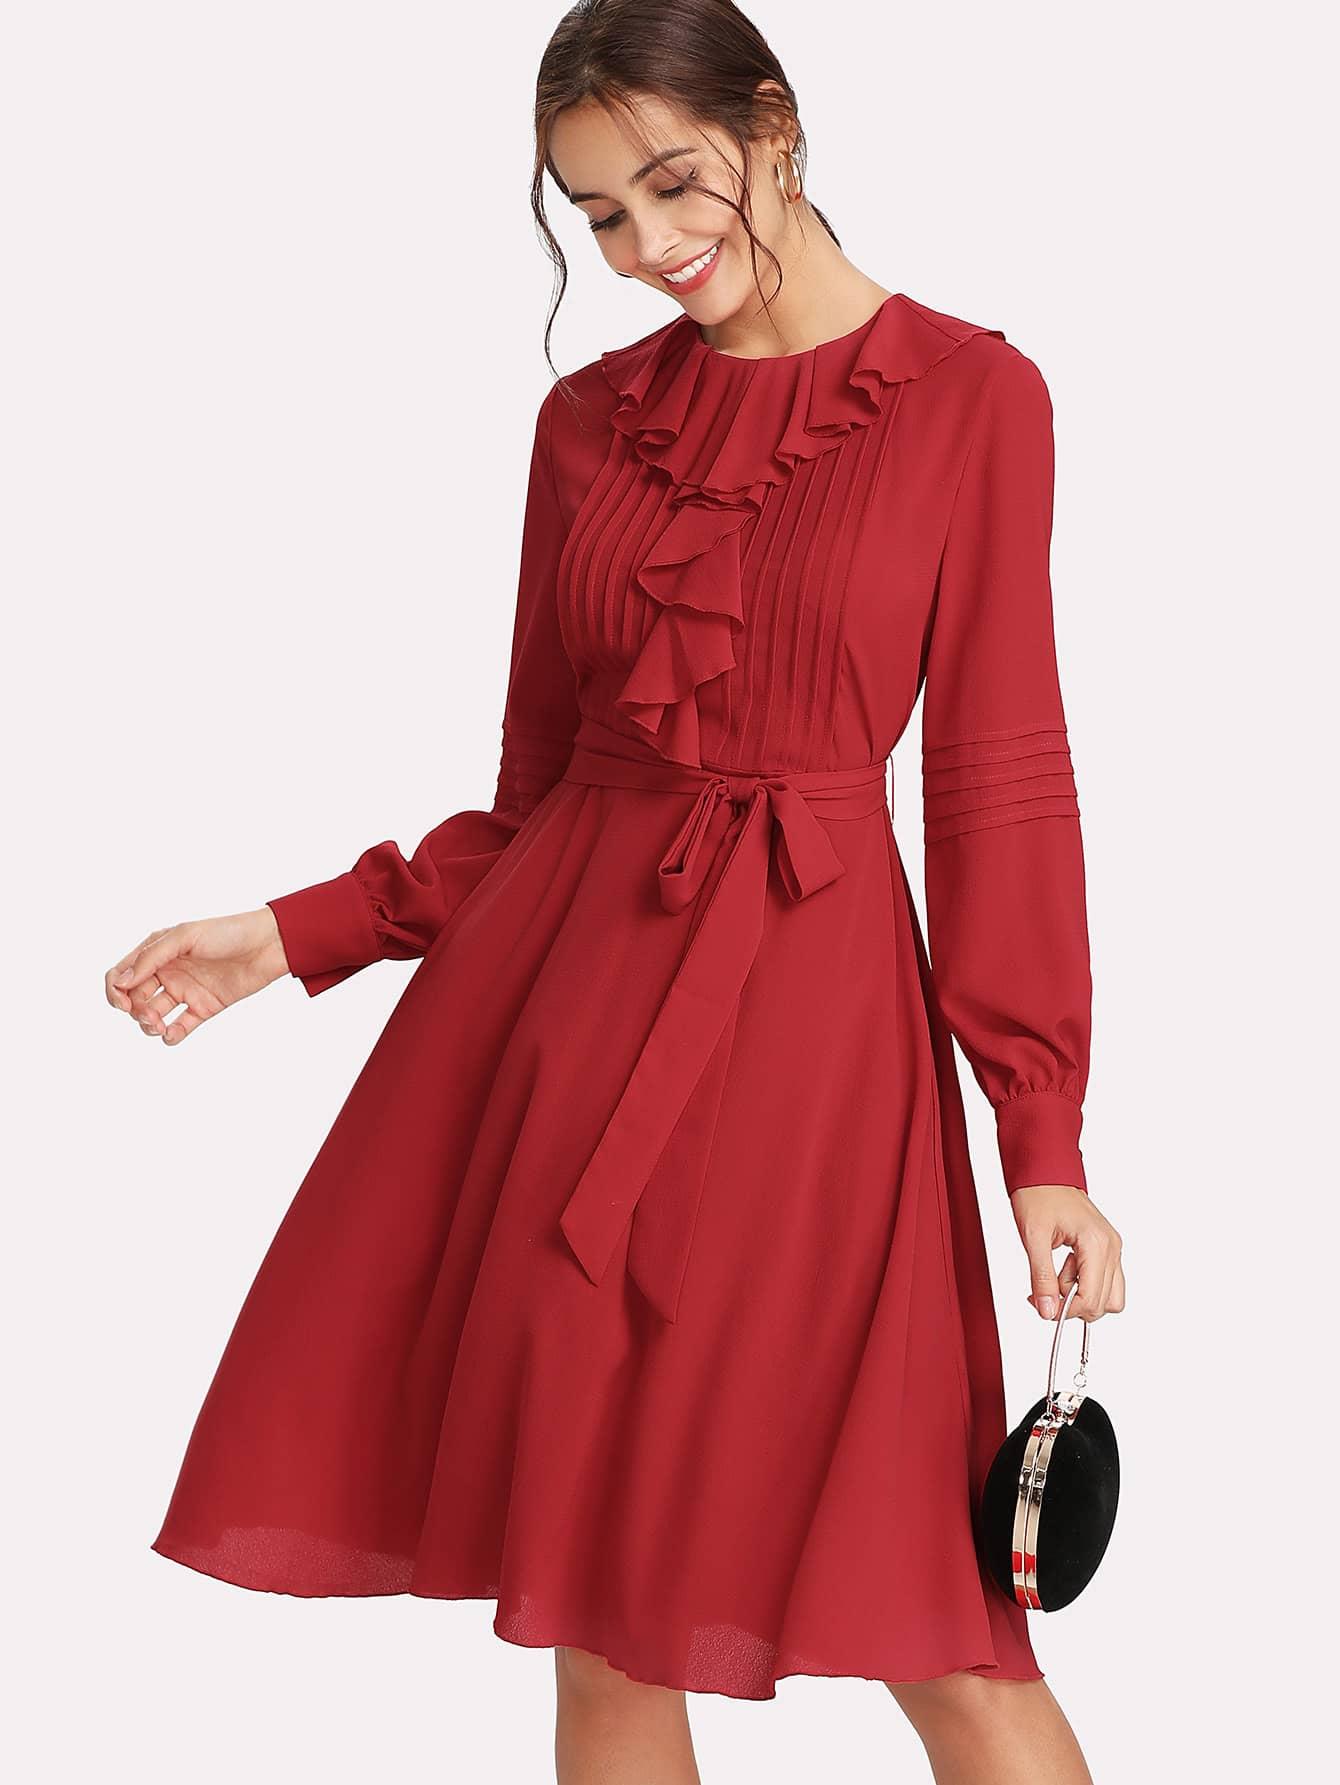 Self Tie Waist Ruffle Trim Dress self tie waist ruffle skirt